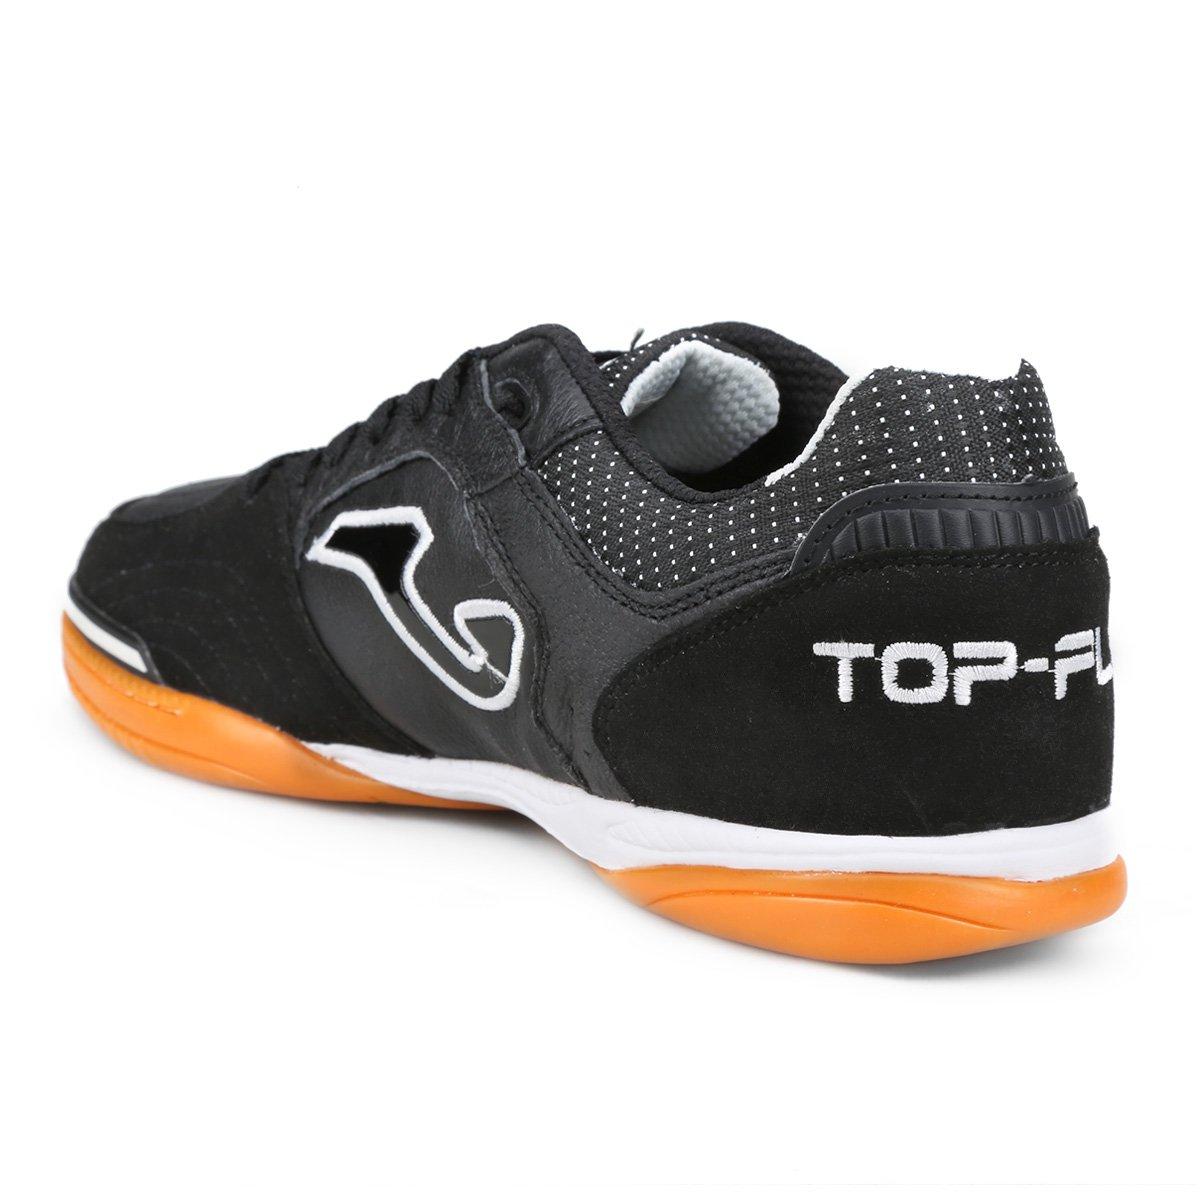 f0c2d92801 Chuteira Futsal Joma Top Flex - Compre Agora